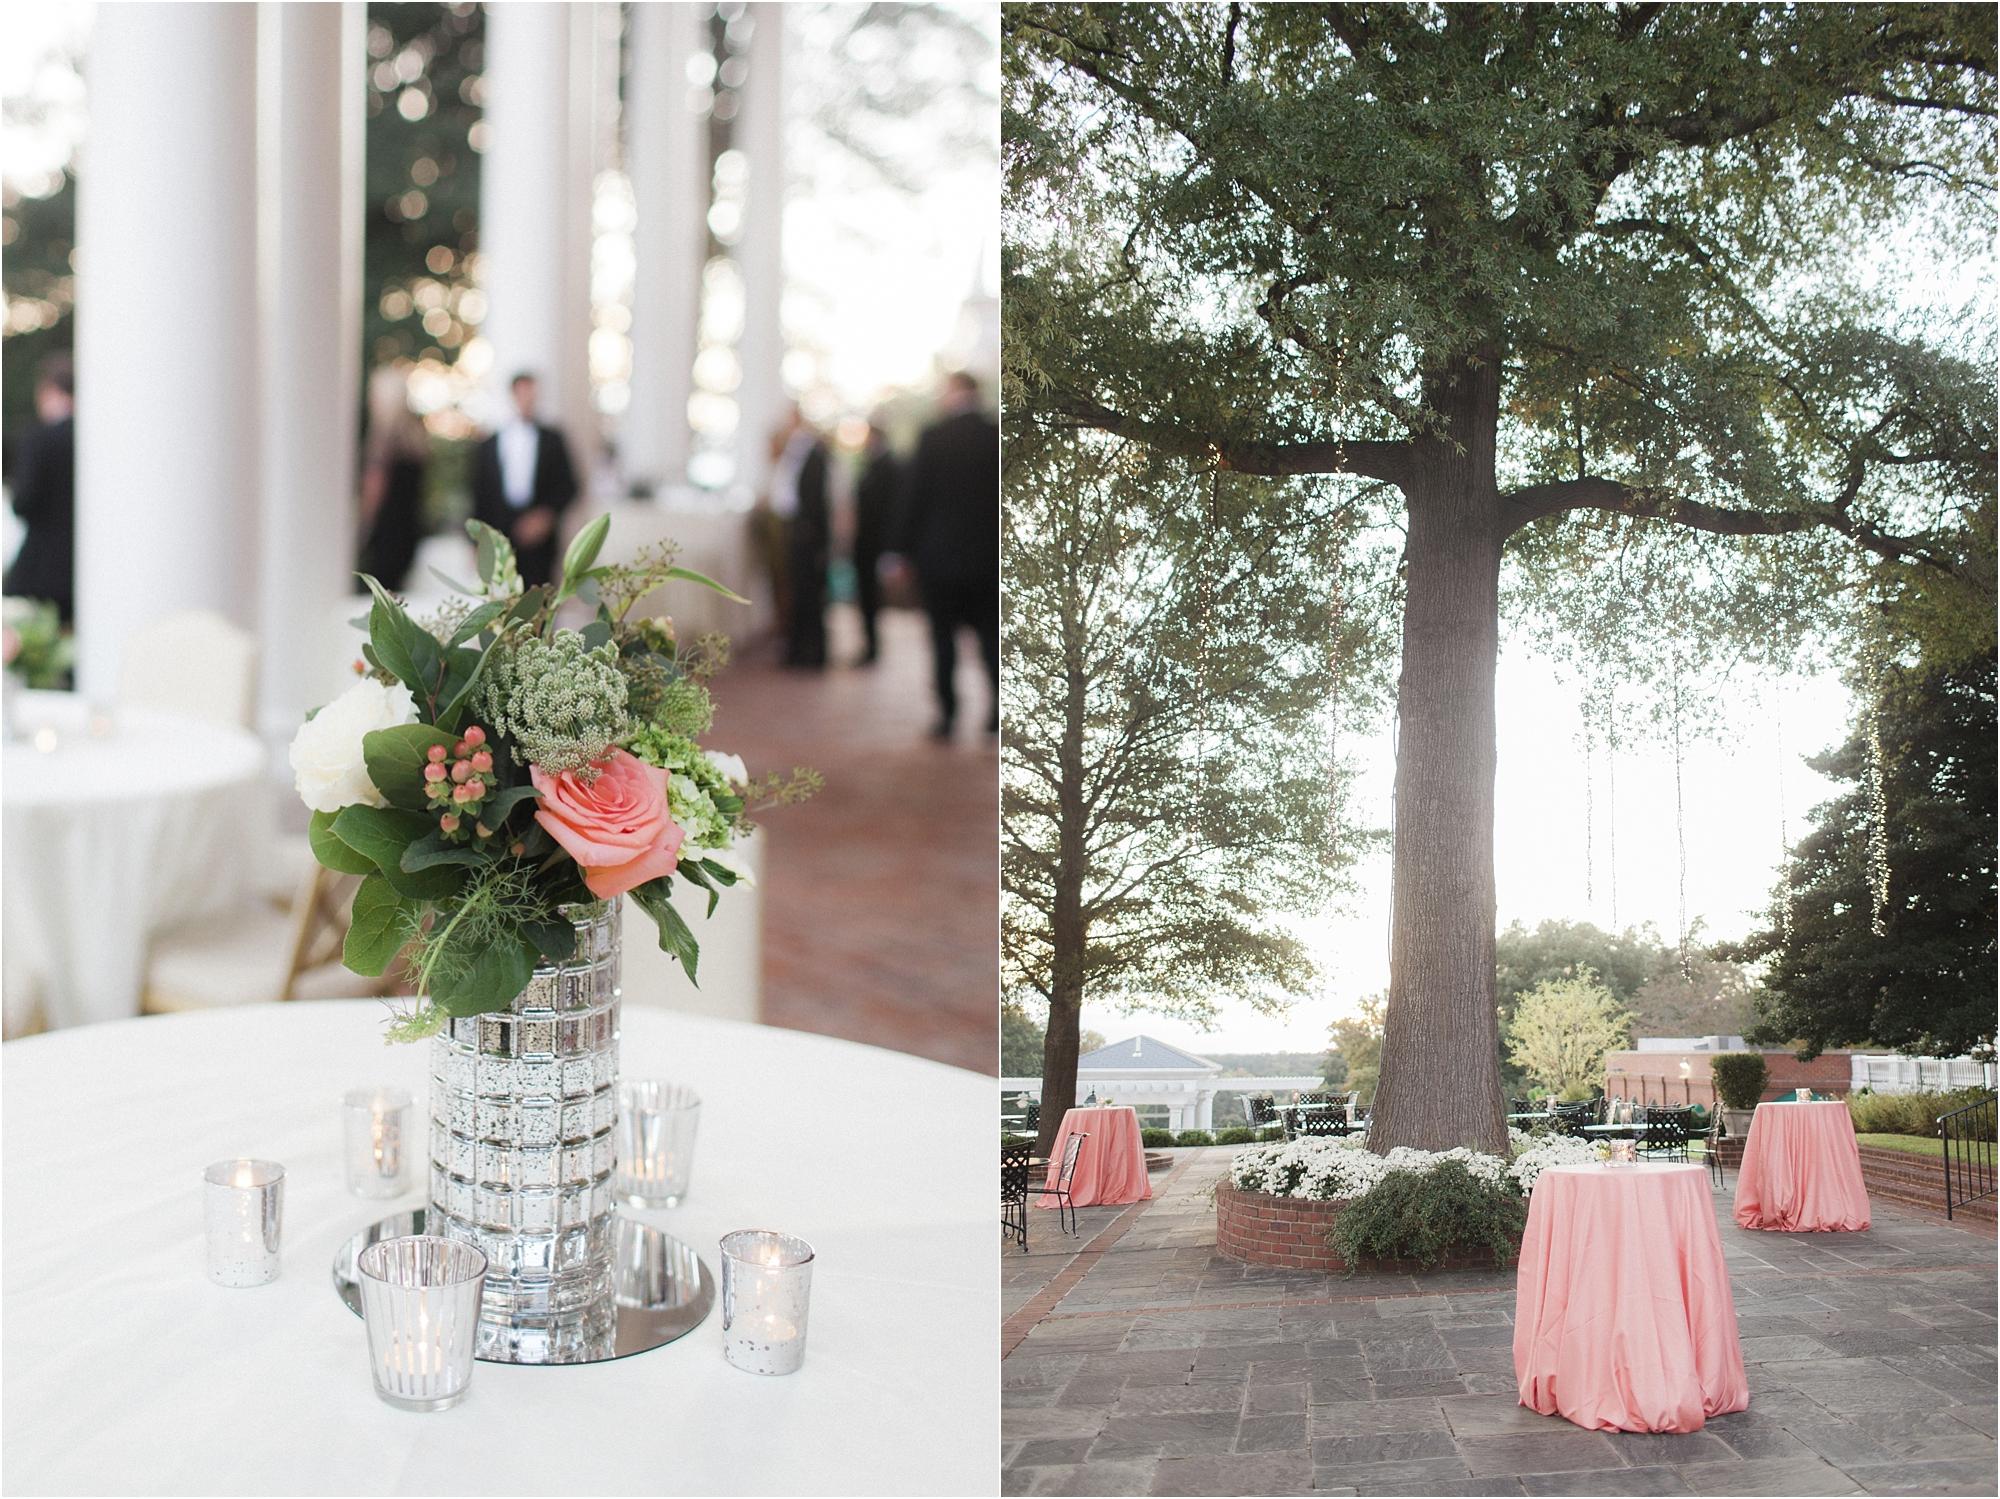 stephanie-yonce-photography-richmond-virginia-country-club-wedding-photo_033.JPG